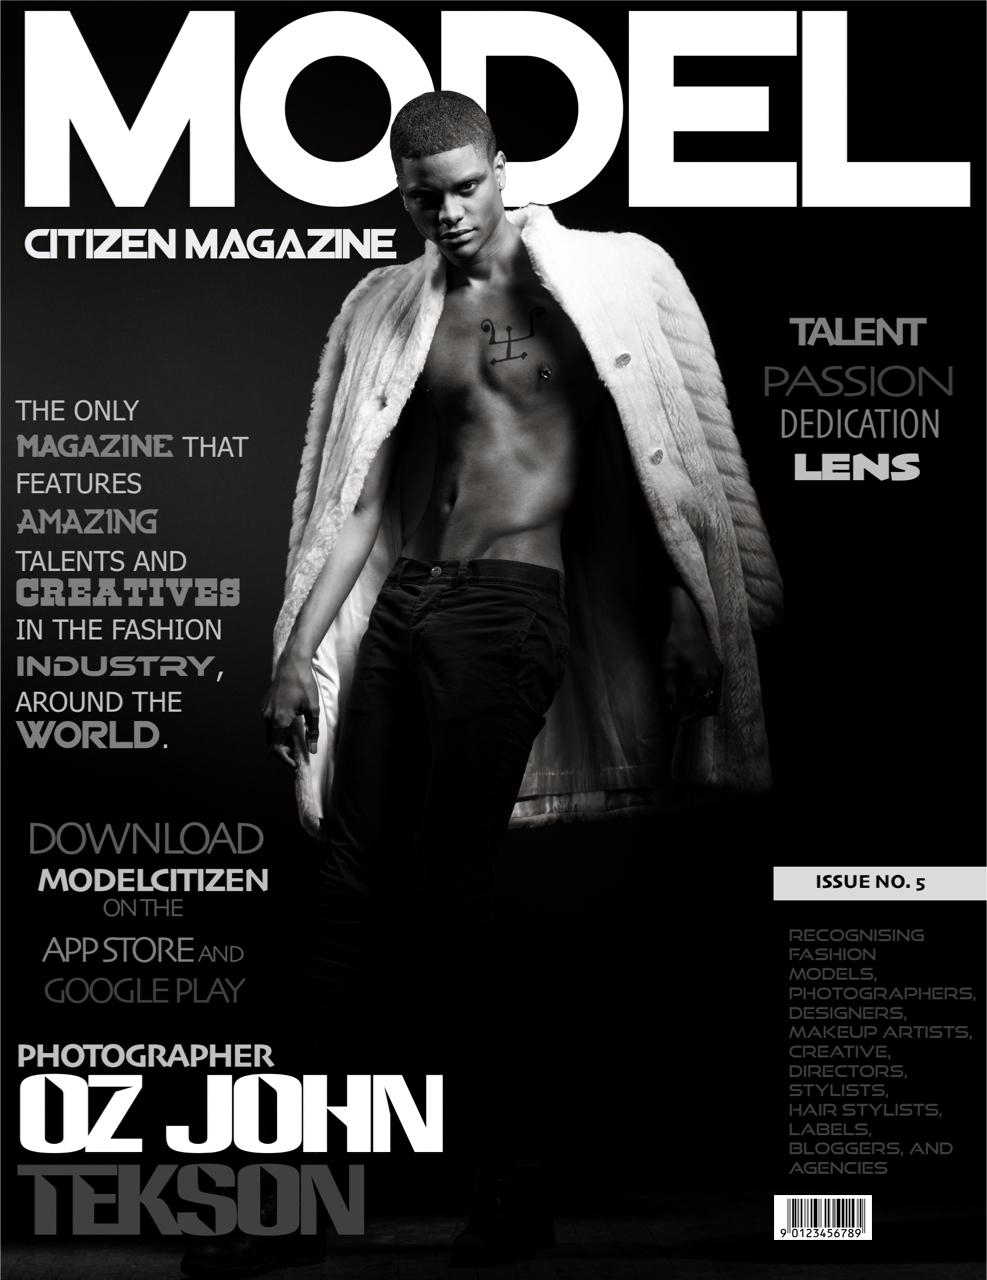 ModelCitizenMagazine_coverBarcoded.jpg